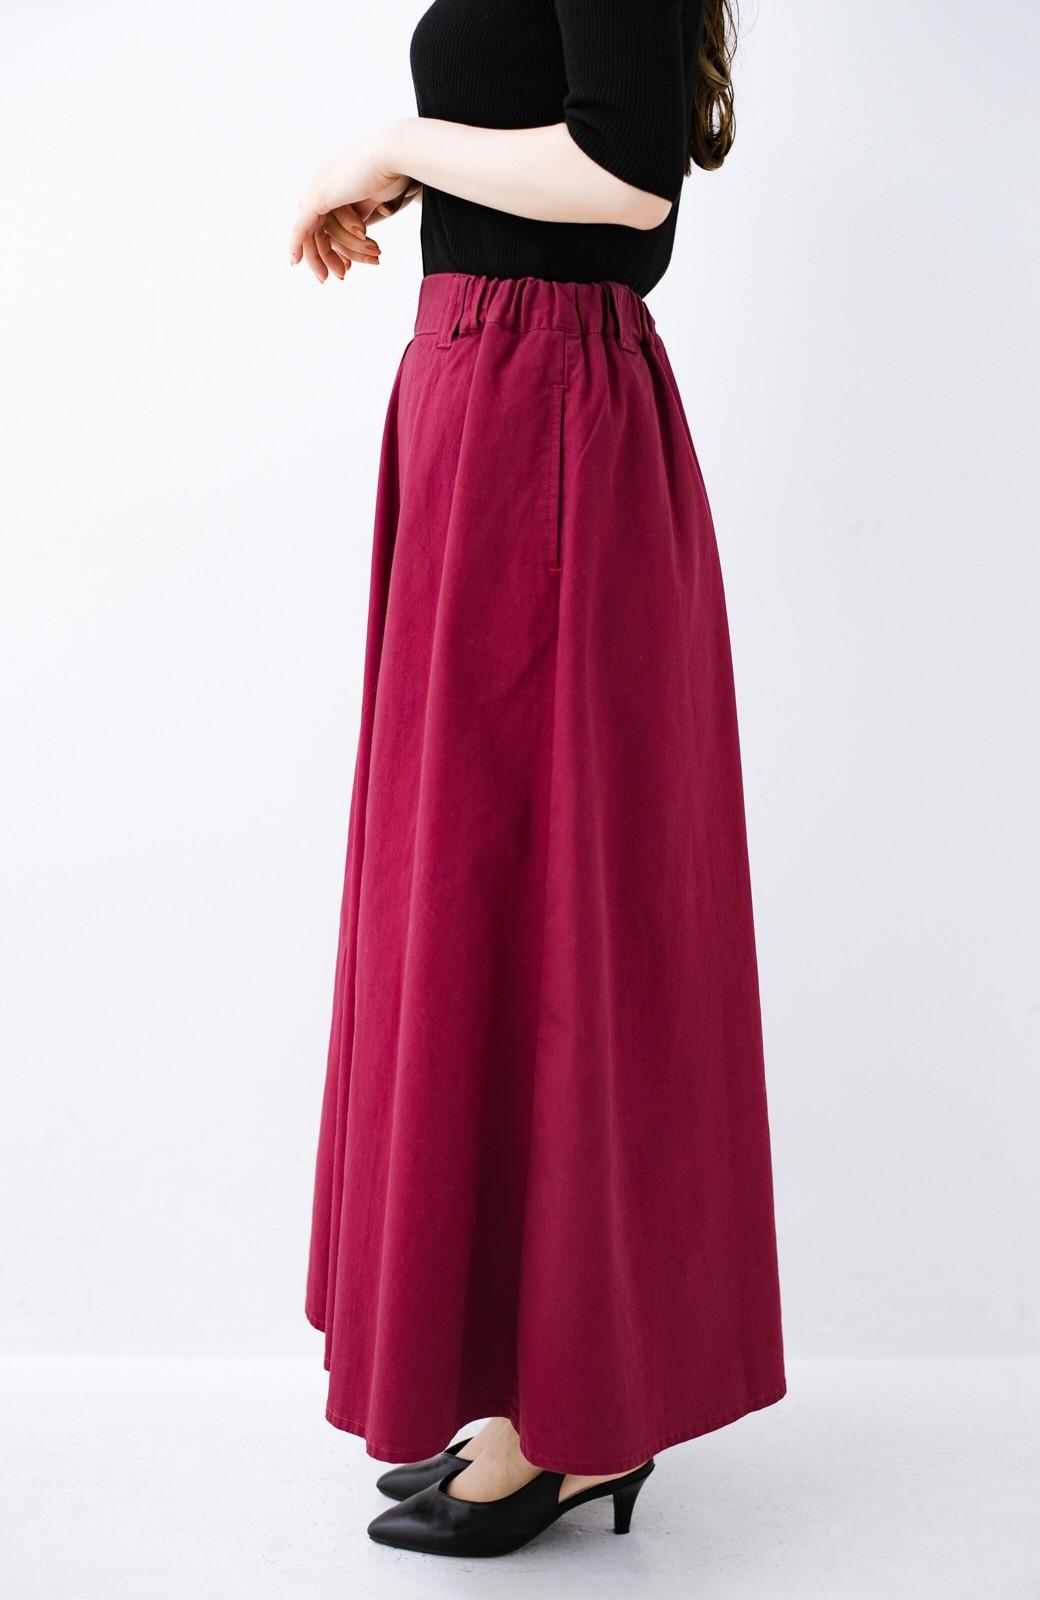 haco! ロングシーズン楽しめる タックボリュームのチノロングスカート <パープル>の商品写真5